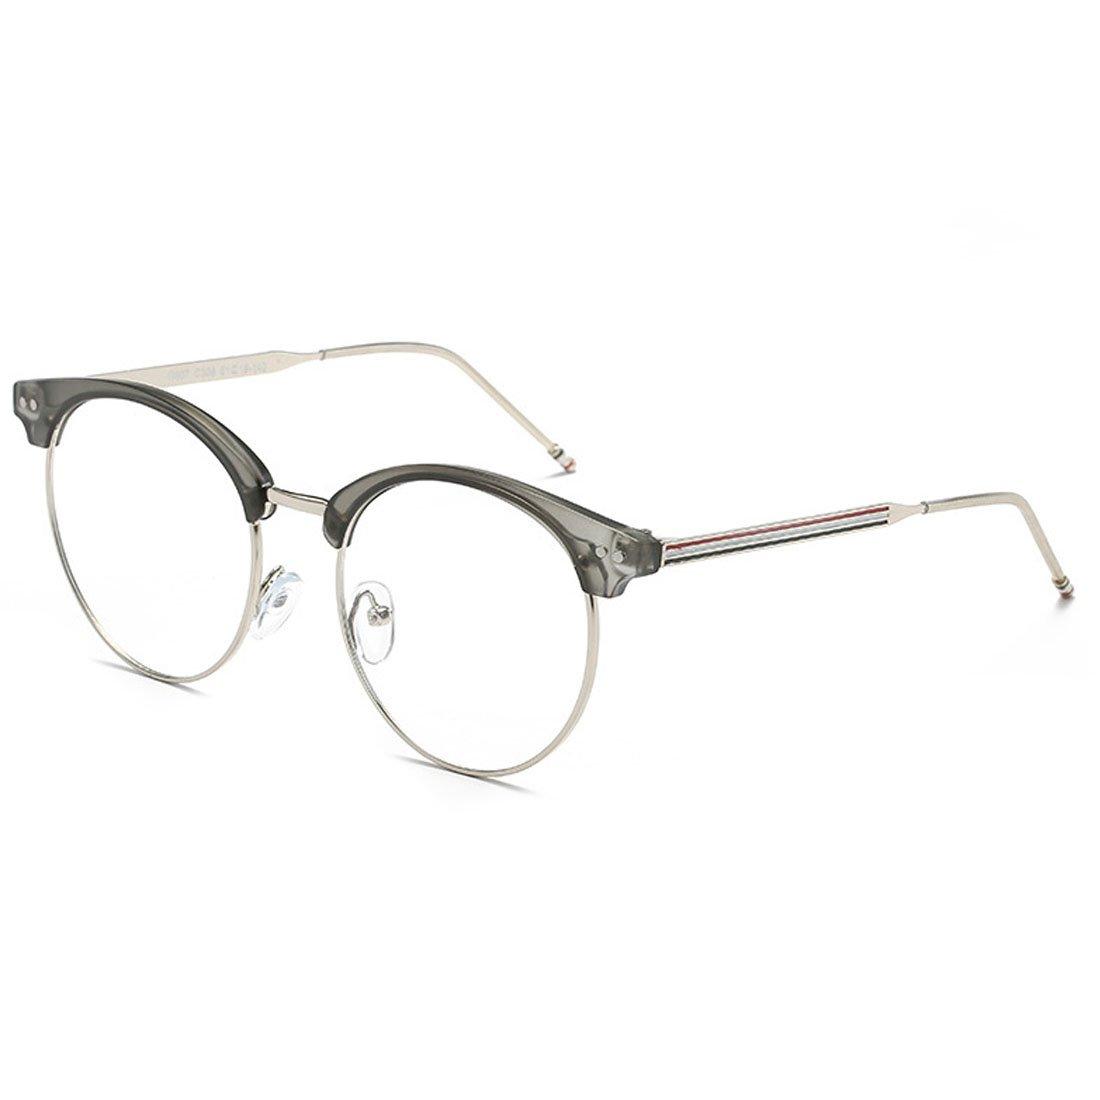 f56af527b80 Amazon.com  D.King Vintage Optical Round Eyewear Eye Glasses Frame with  Clear Lenses Black Gold  Clothing